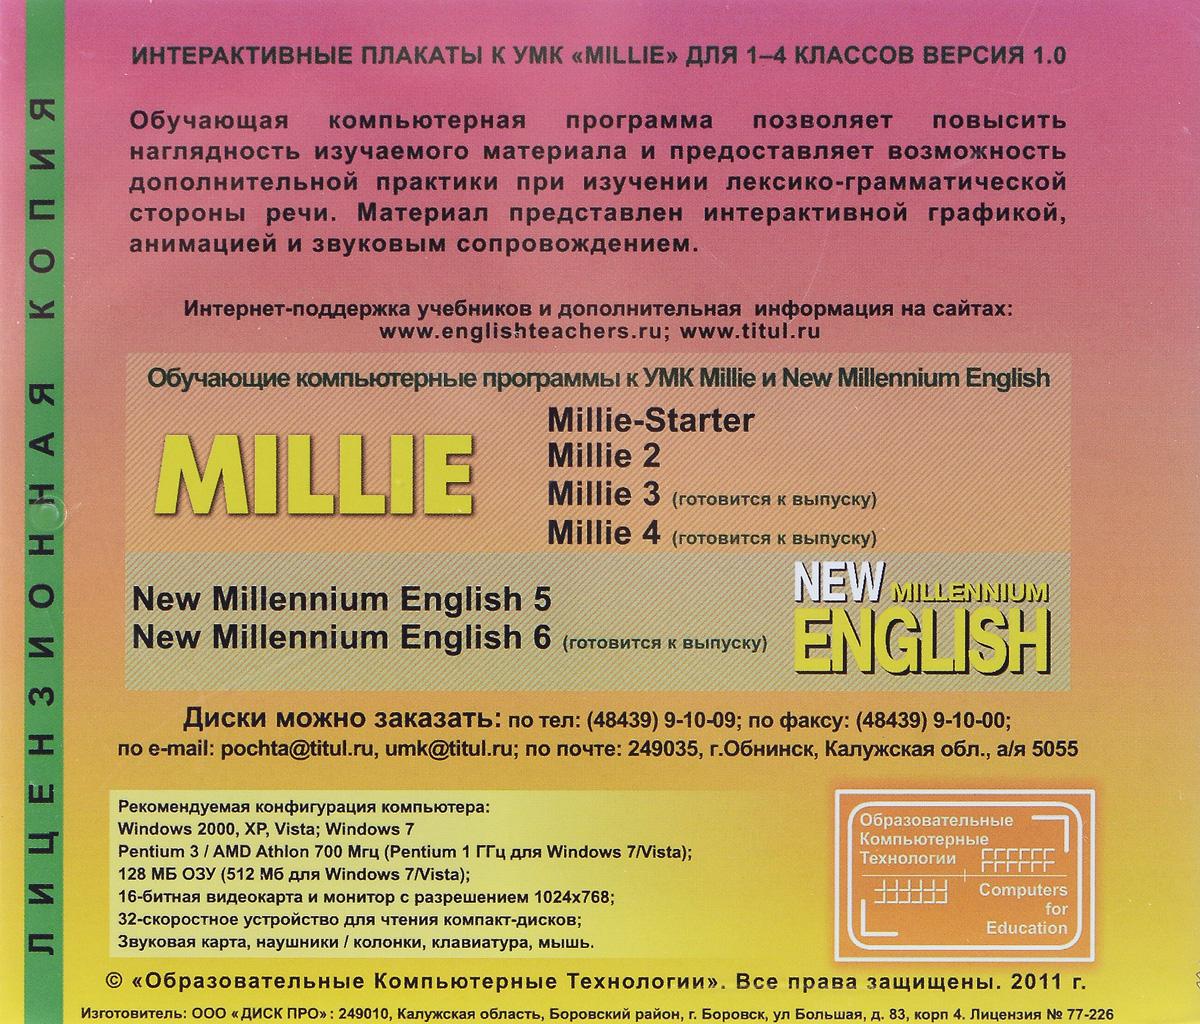 Millie 1-4 / Милли. Английский язык. 1-4 класс. Интерактивные плакаты. Обучающая компьютерная программа